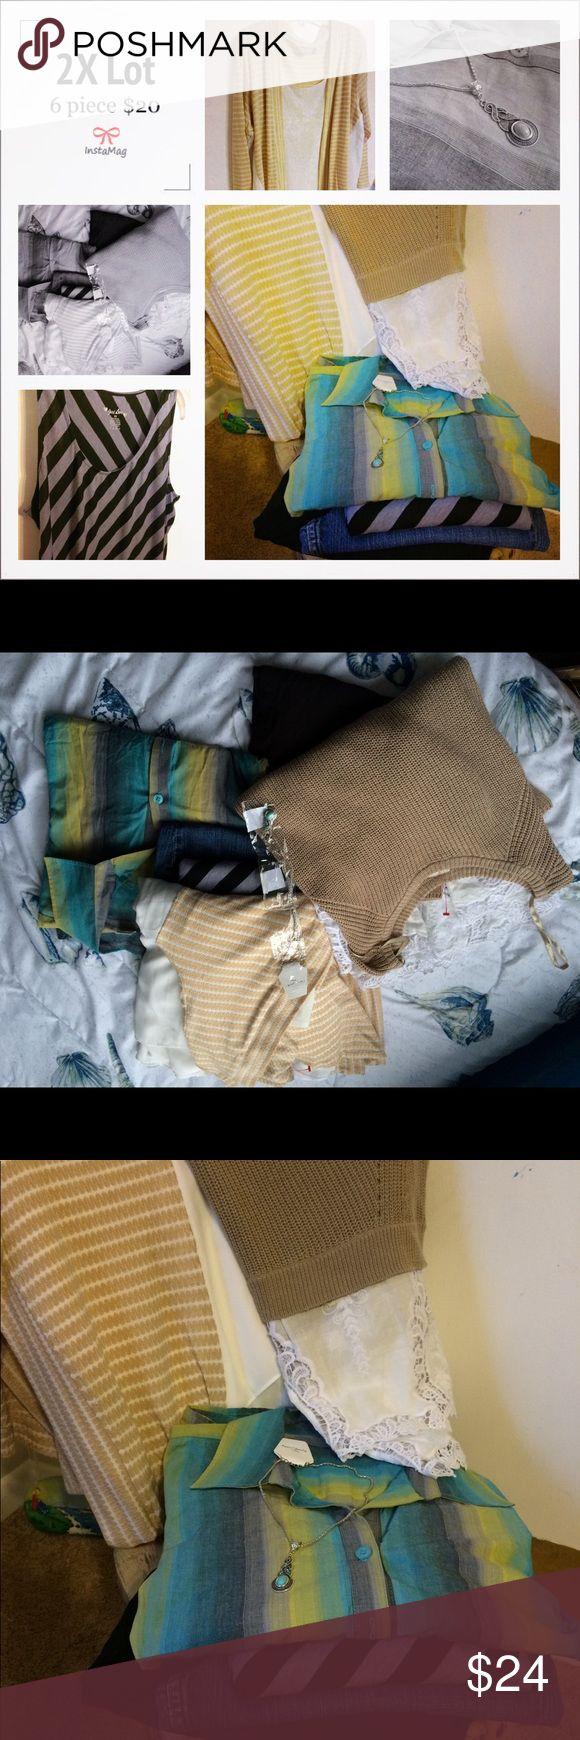 2X 7 Piece Bundle / Lot The Bundle Includes:   1. Cato Knit Sweater / Size 18/20 2. Coral Bay Blouse / Size 2X 3. Erika Ombre Button Down Blouse / Size 2X 4. Just Love Striped Maxi Dress / Size 2X 5. Levis Signature Bootcut Jeans / Size 18 6. Avenue Black Shorts / Size 20  7. Turquoise Necklace       Please Message Me For a Tailored Bundle Your Size. 5 Pieces = $20 Other